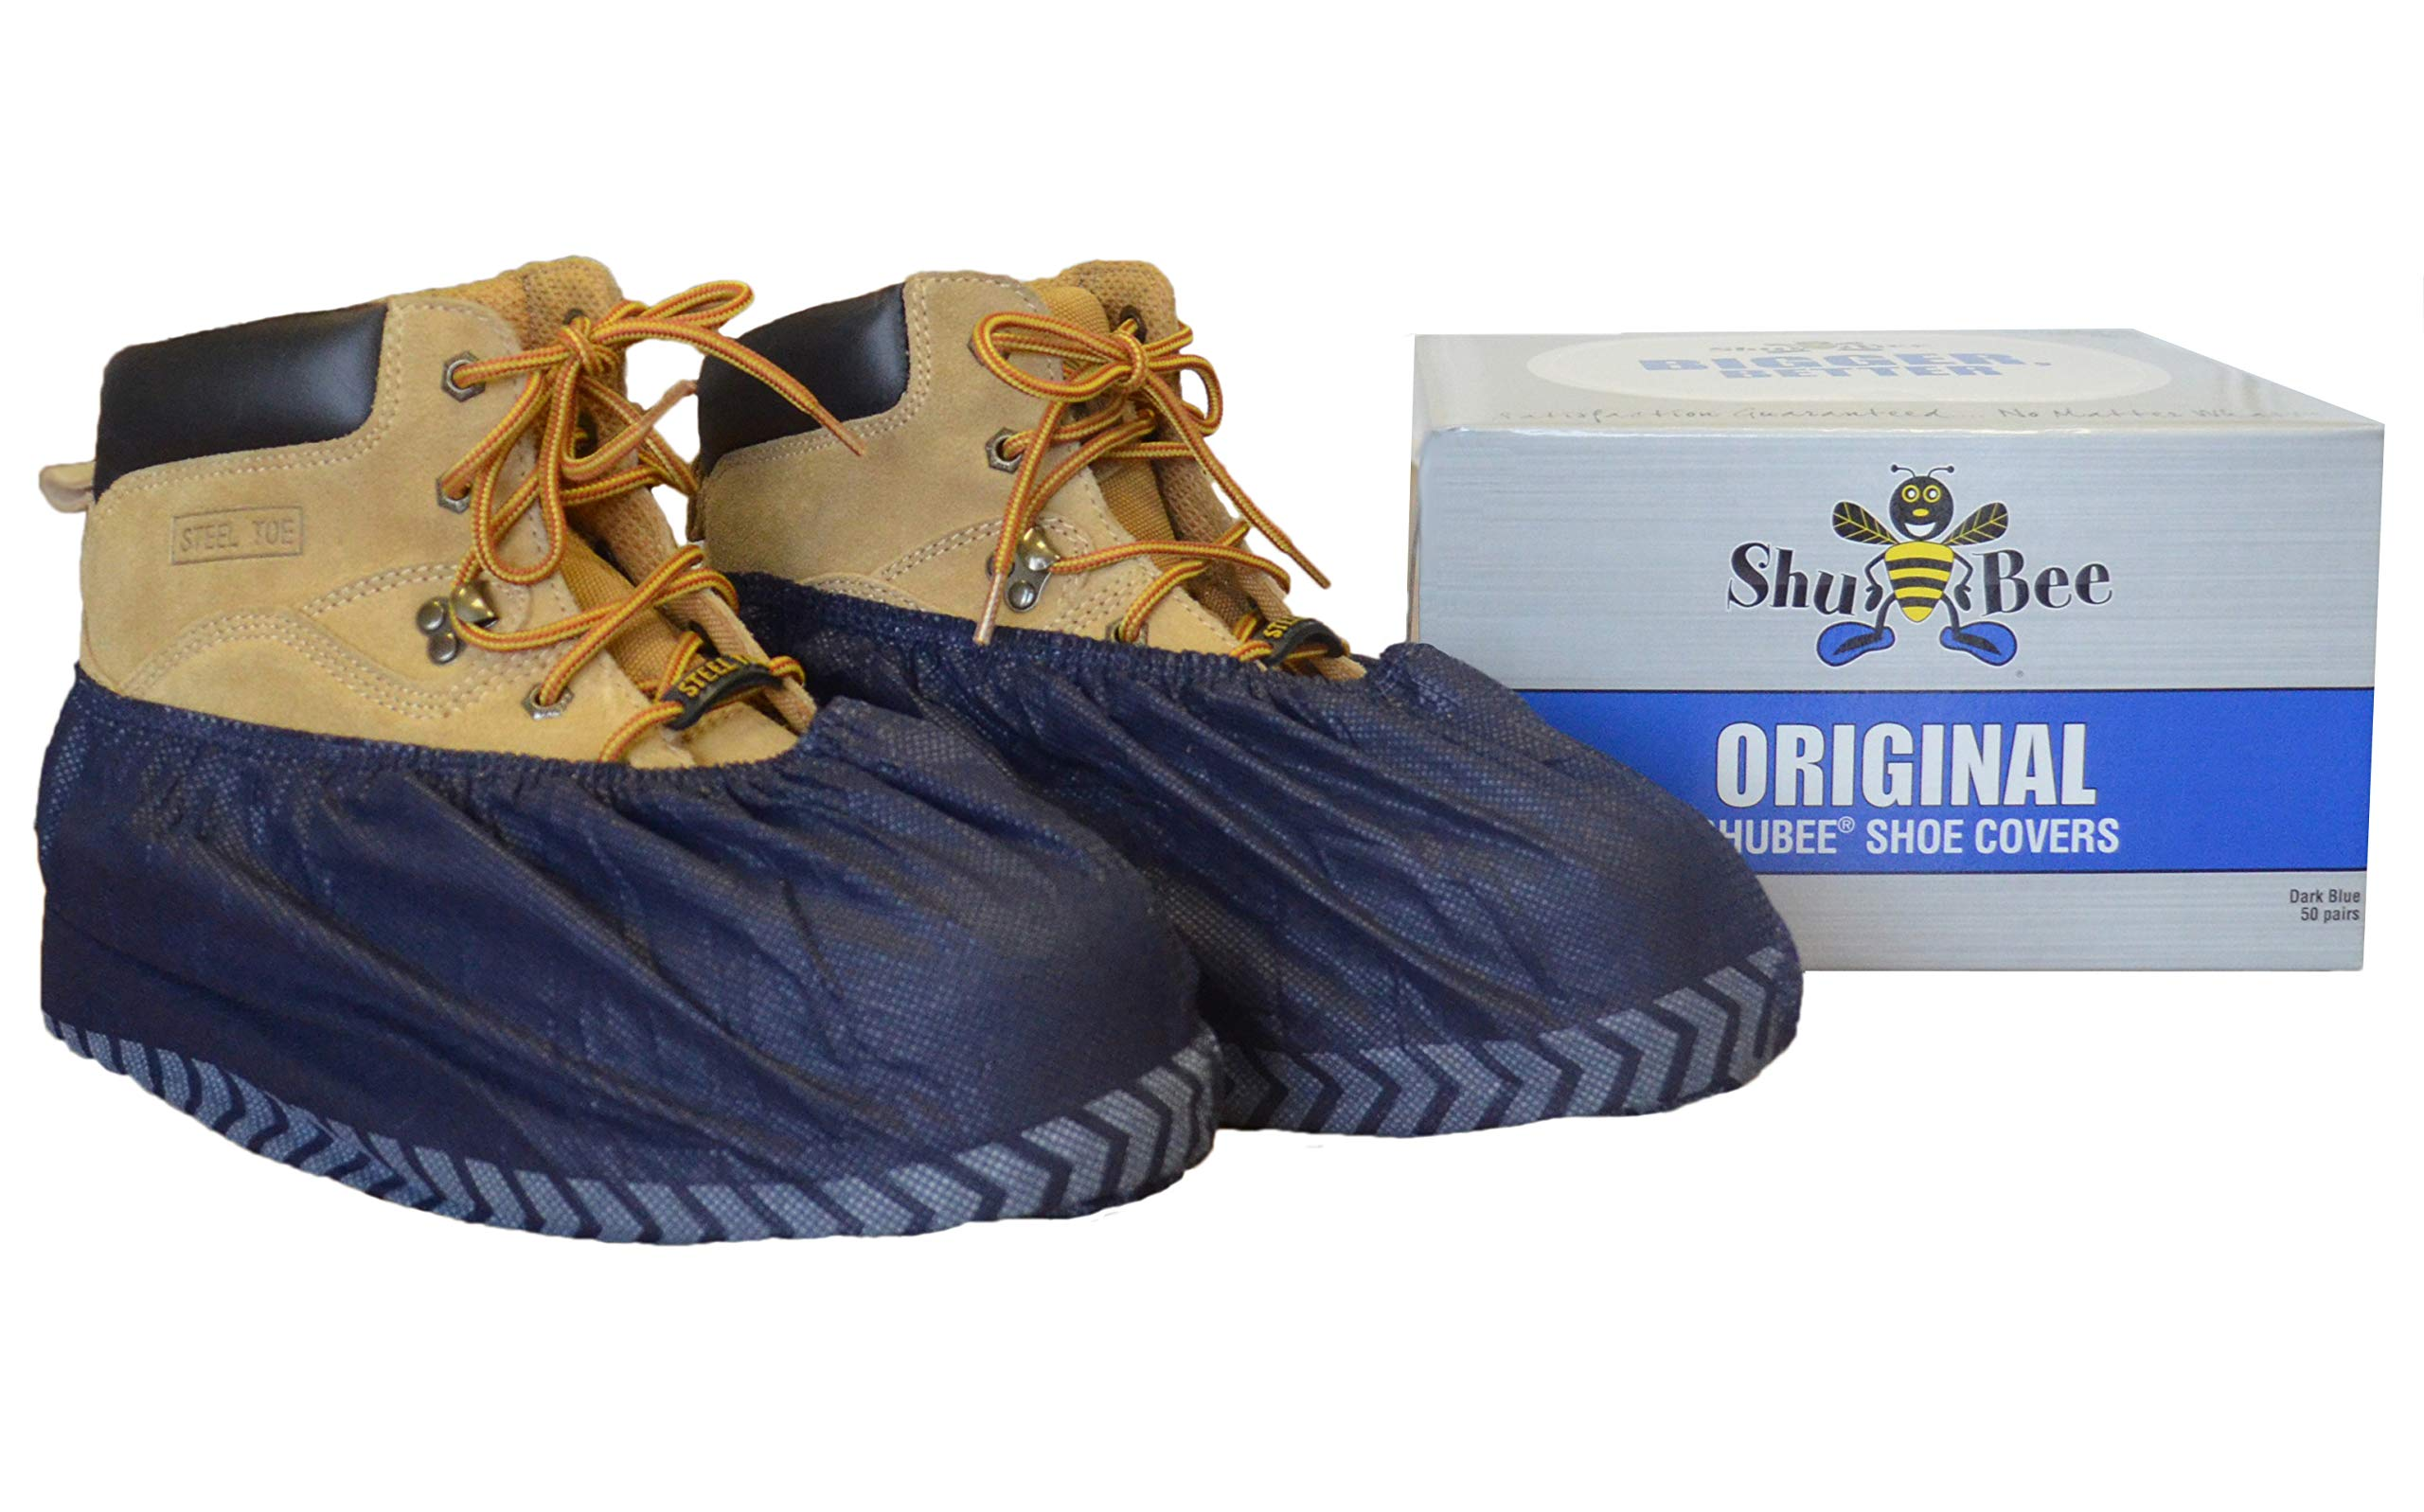 ShuBee Original Shoe Covers, Dark Blue (50 Pair)